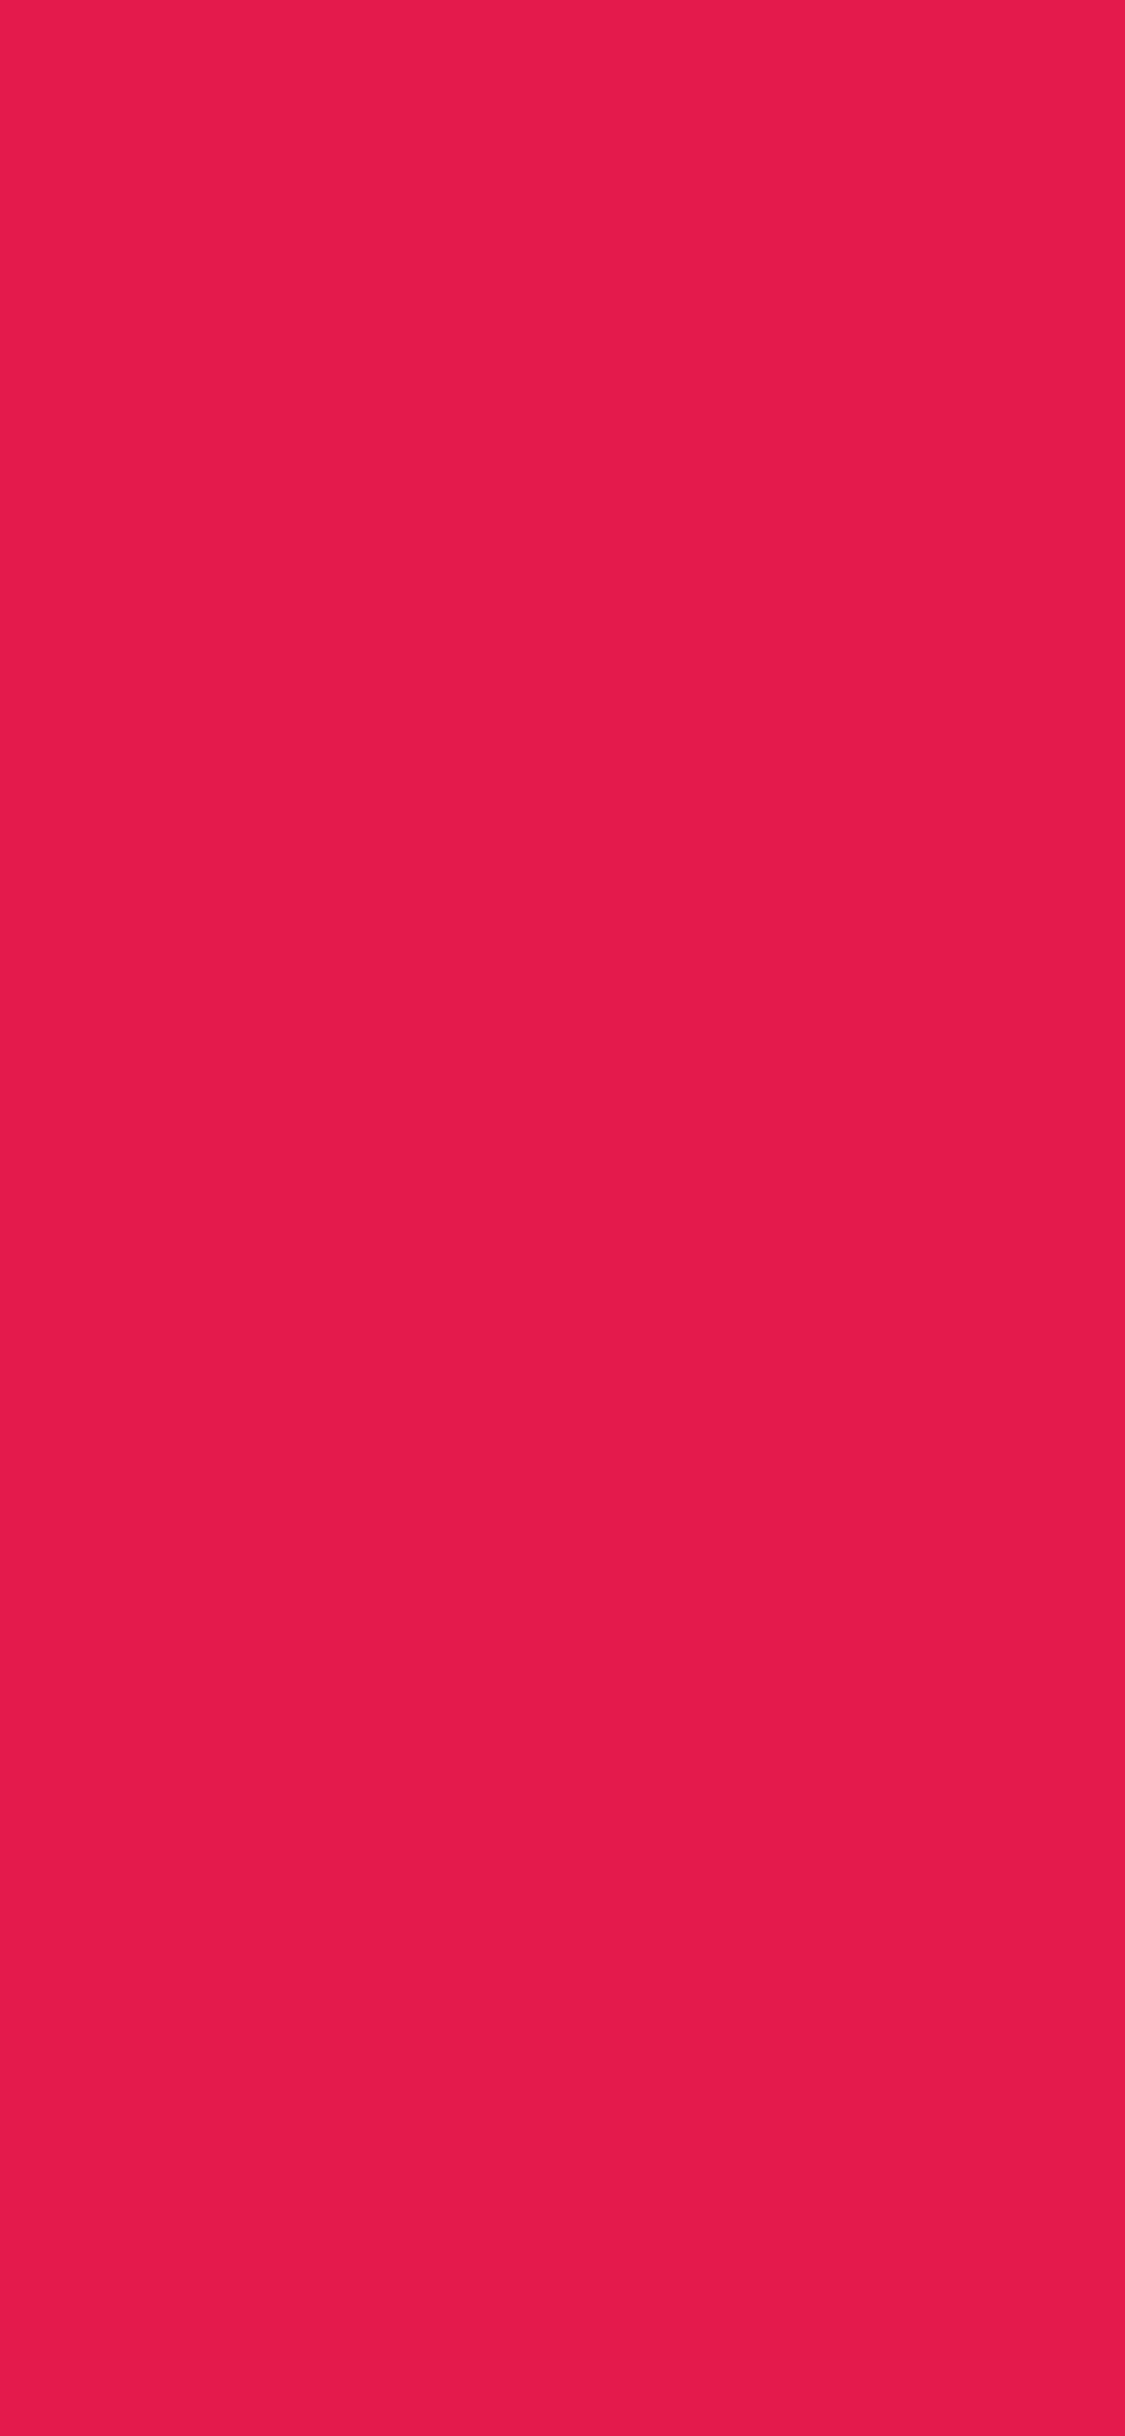 1125x2436 Spanish Crimson Solid Color Background